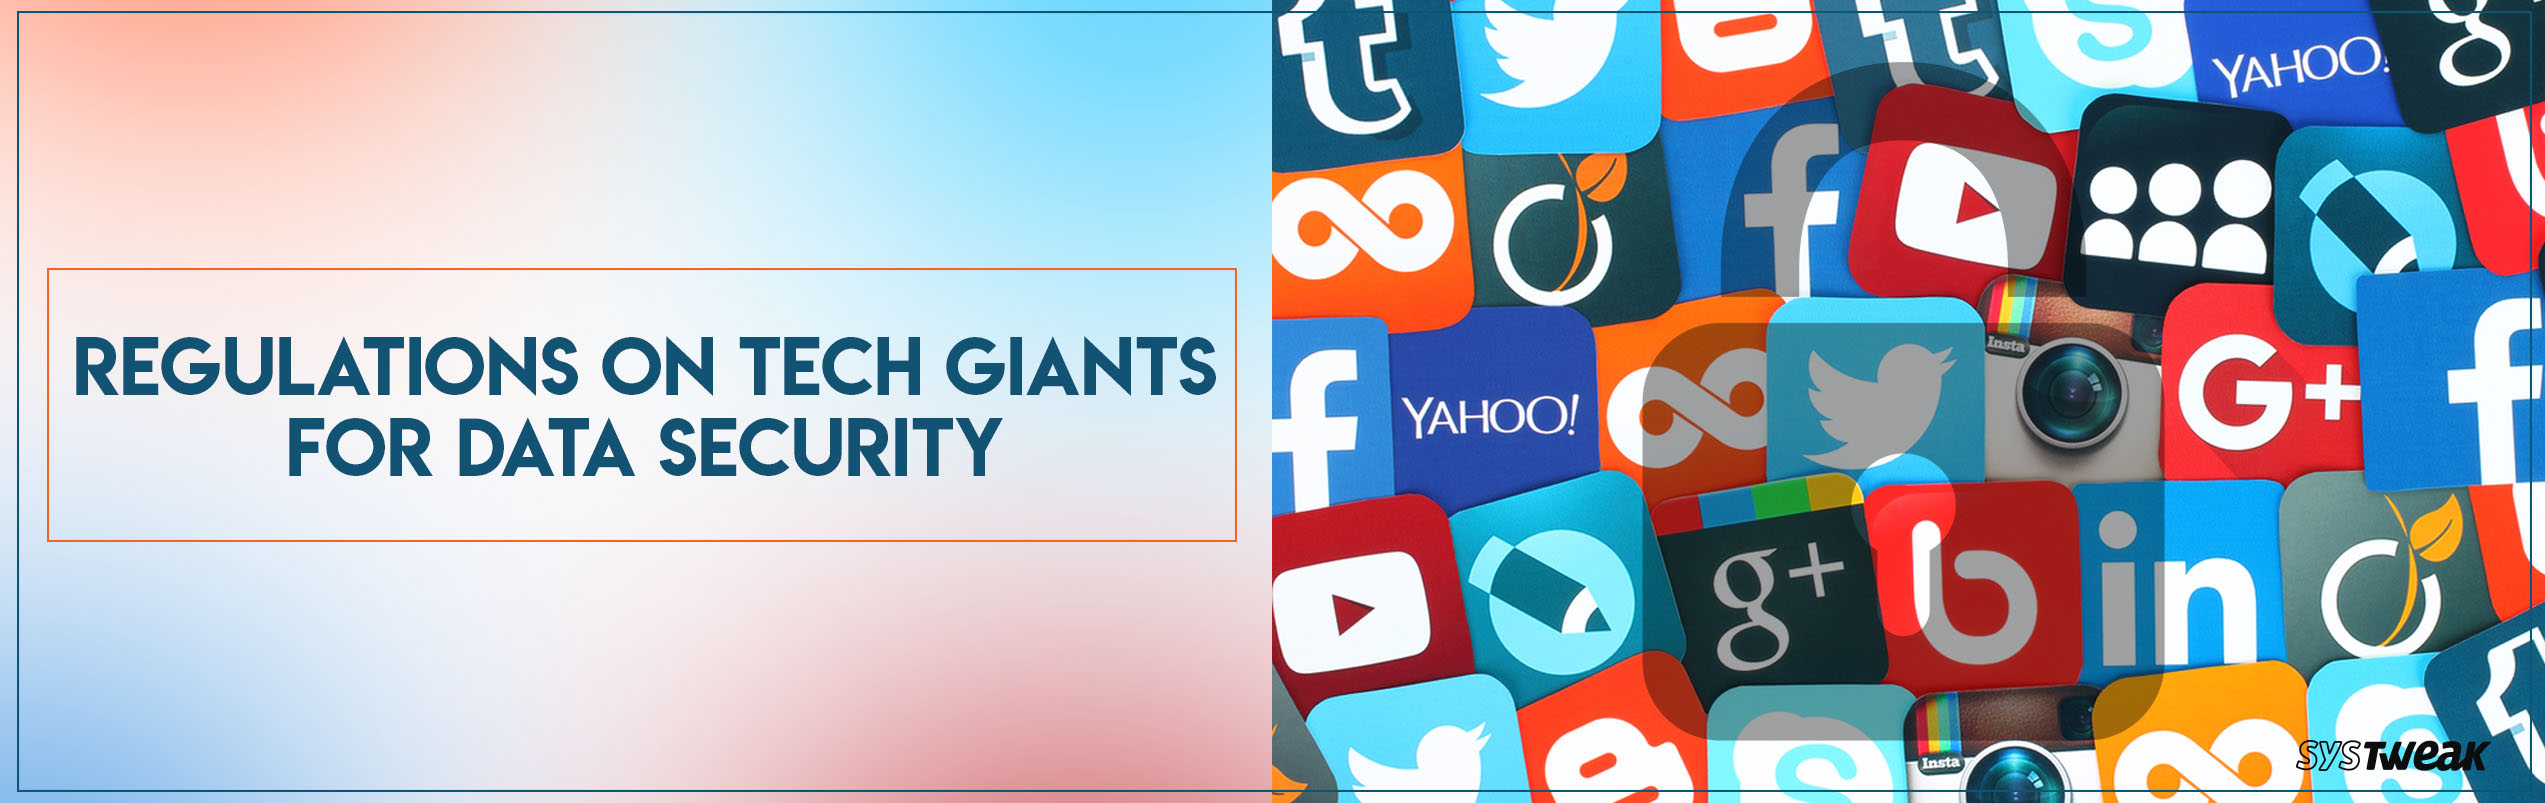 Do We Need Bank-Like Regulations On Tech Giants For Data Security?